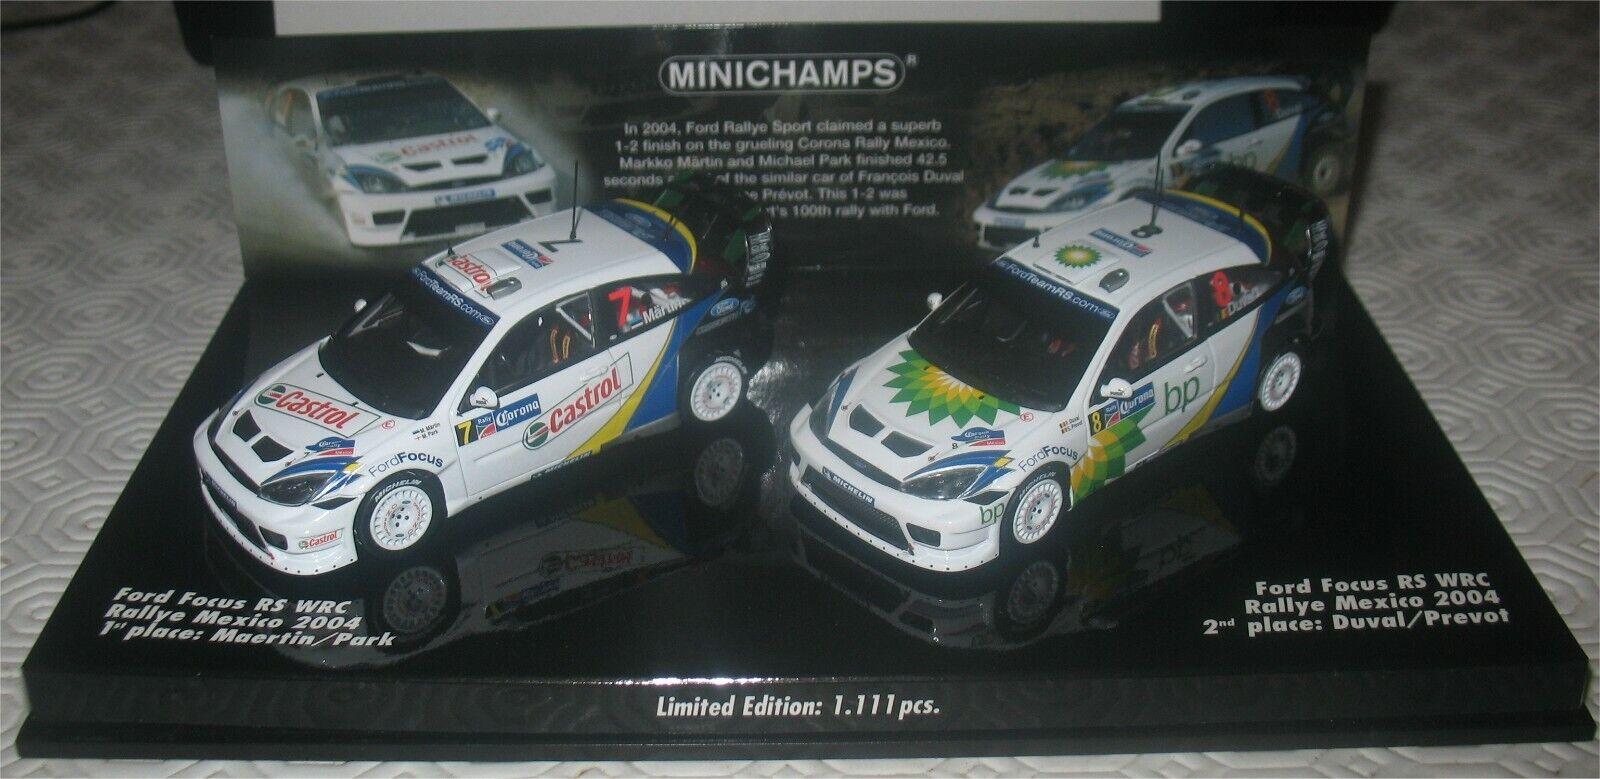 gran descuento Ford Focus WRC - 1st y 2nd Rally Rally Rally México 2004-M. Martin, F. Duval  Venta en línea de descuento de fábrica